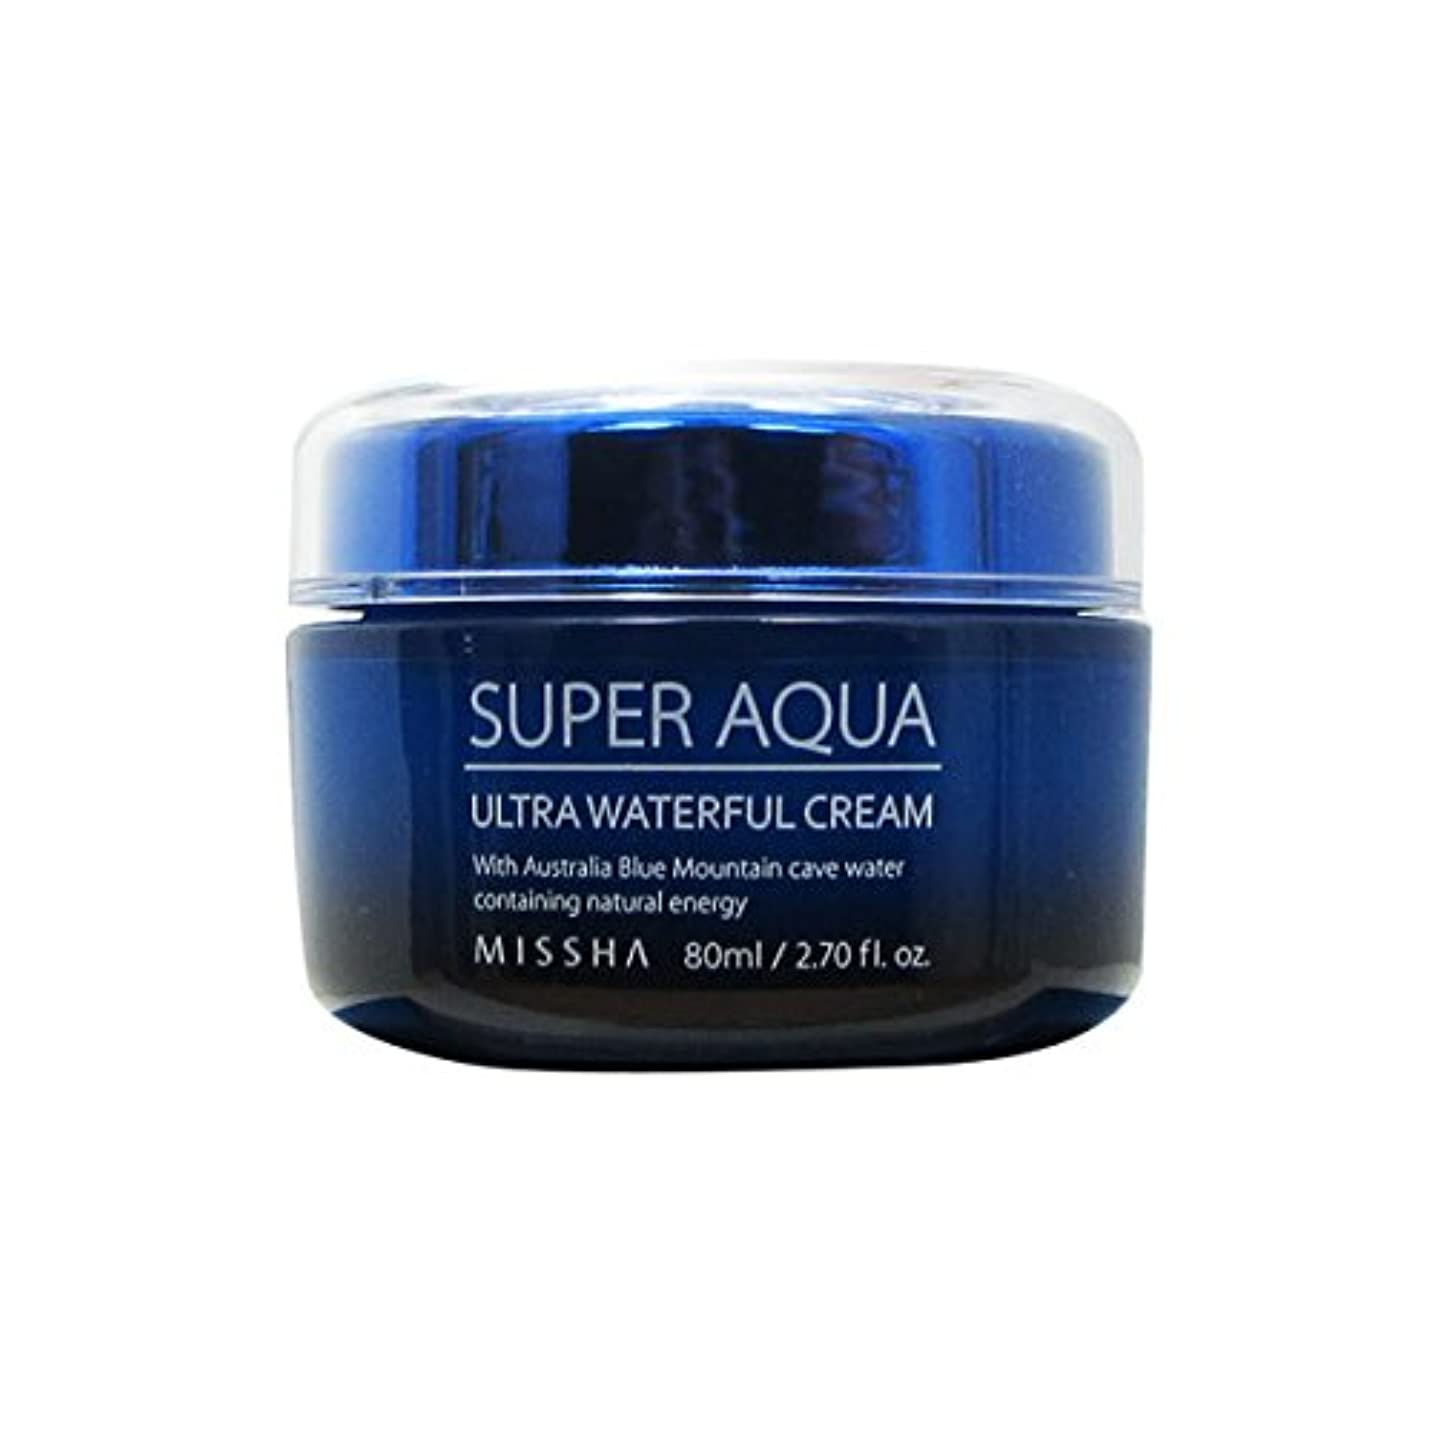 Missha Super Aqua Ultra Waterful Cream 80ml [並行輸入品]